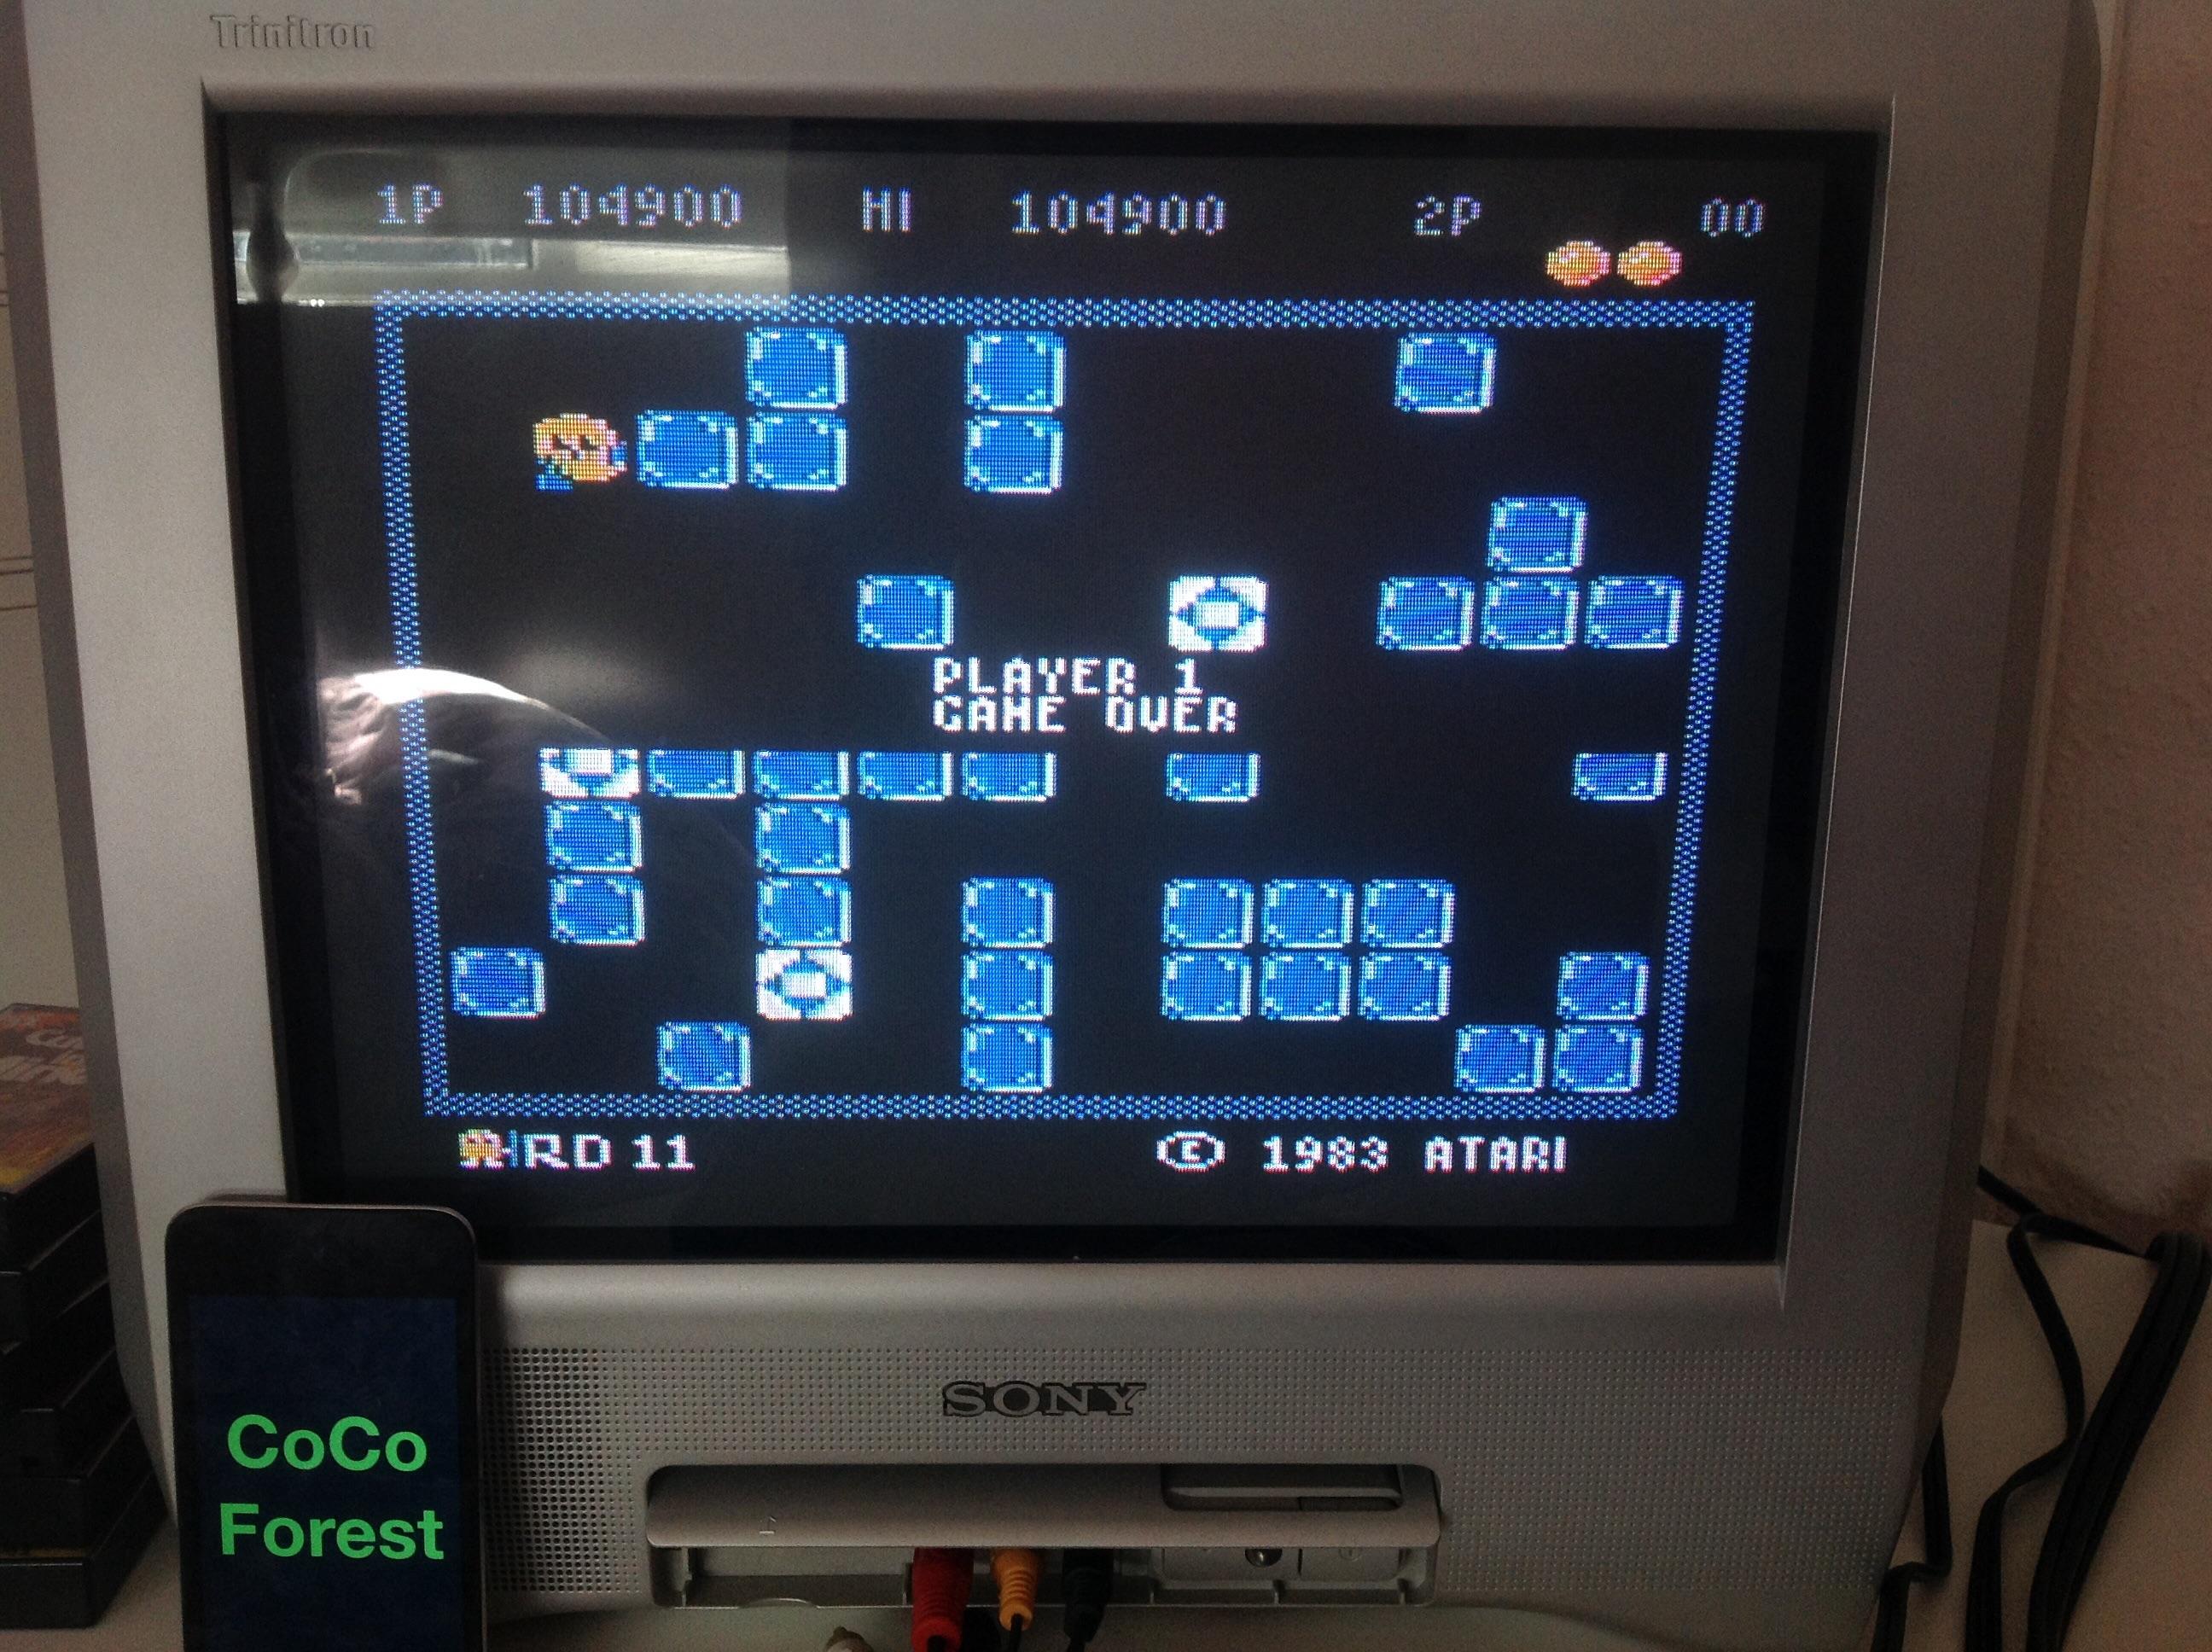 CoCoForest: Pengo: Intermediate (Atari 5200) 104,900 points on 2014-11-04 06:56:02